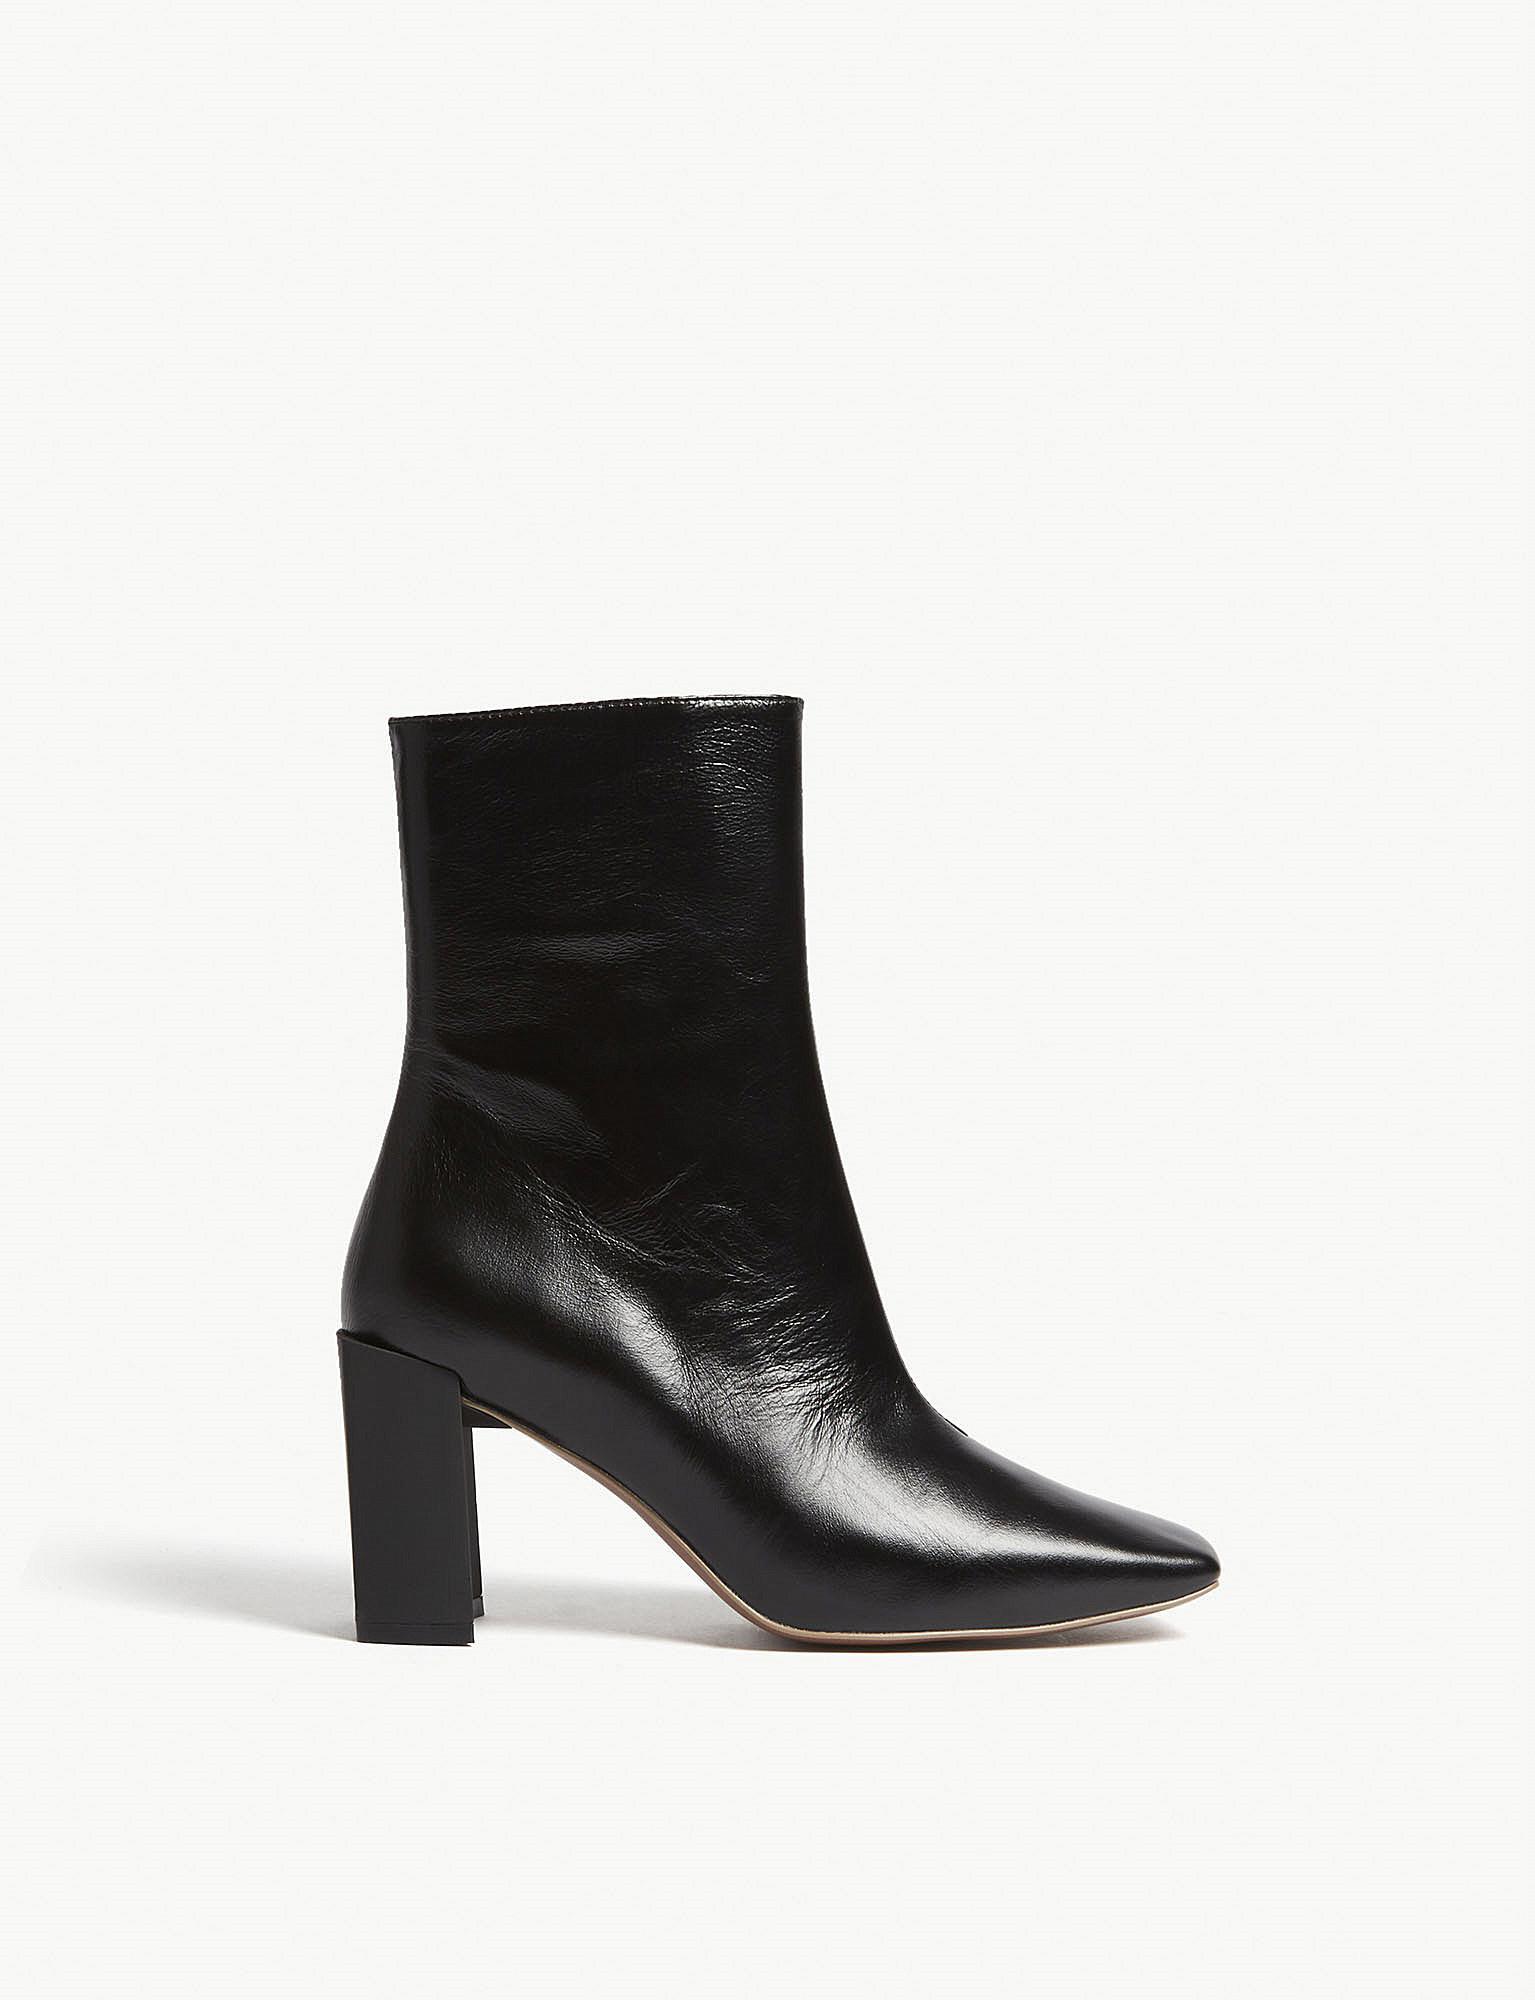 e4be26087b7 Mo&co. Black High-rise Leather Boots